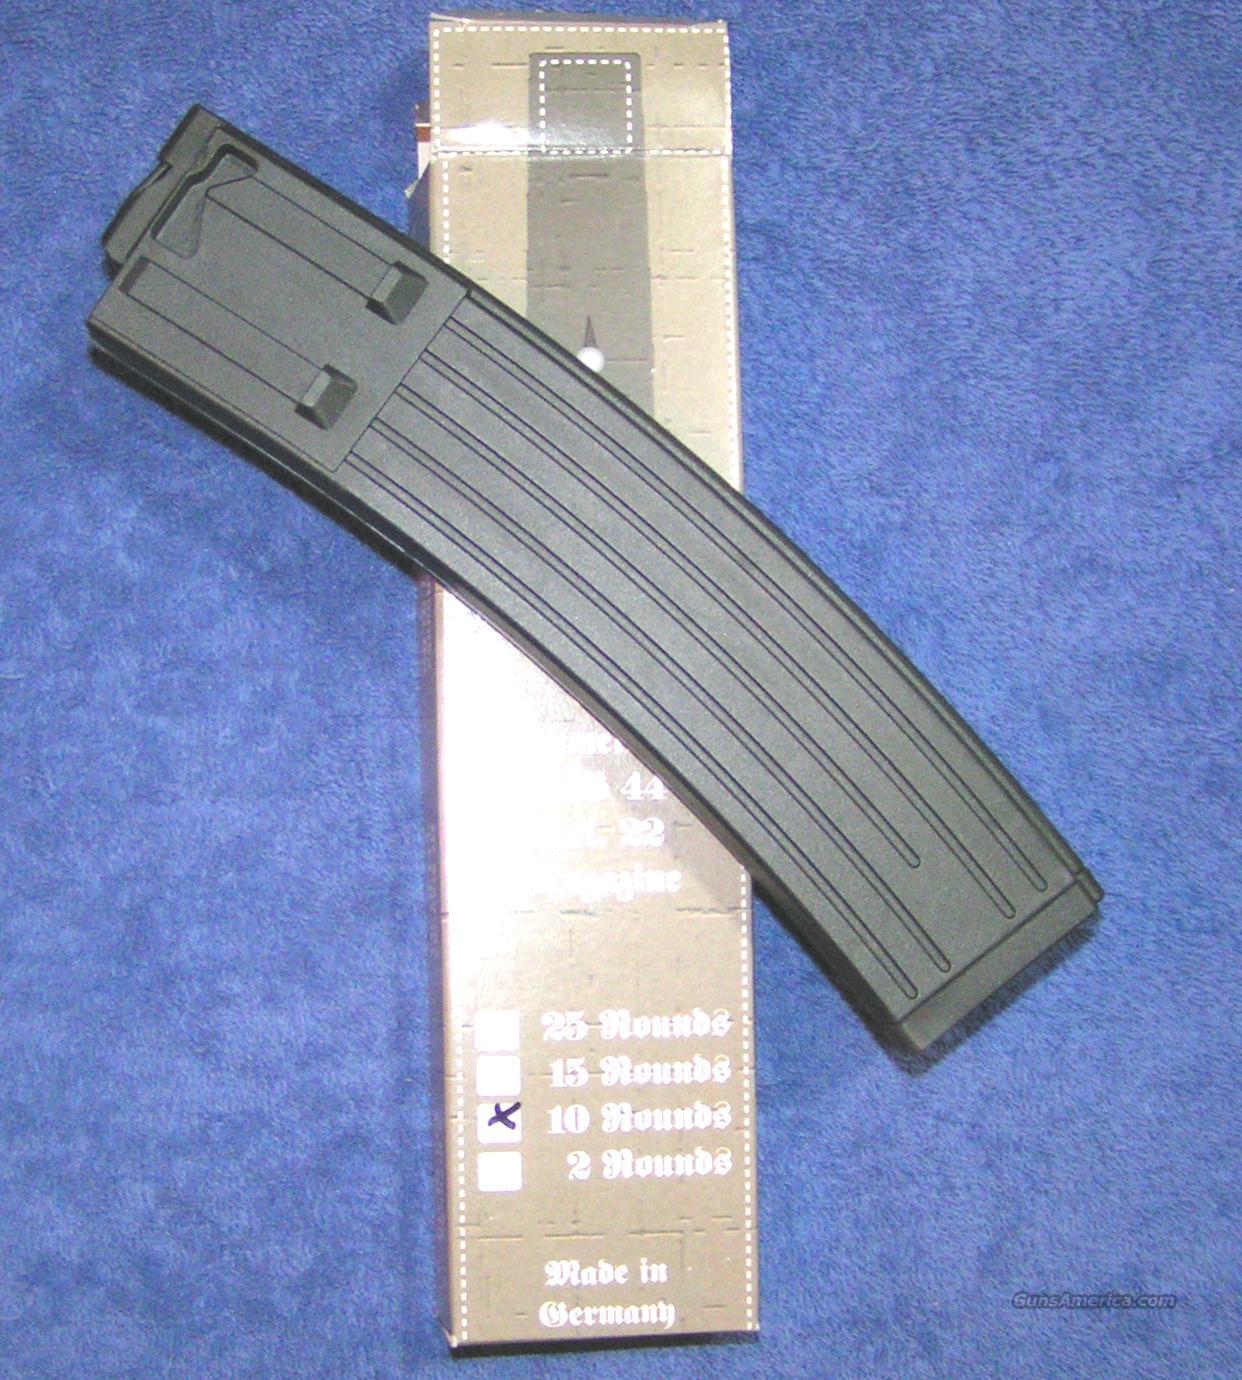 GSG STG-44 mag 10 round STG44 22LR New  Non-Guns > Magazines & Clips > Rifle Magazines > Other